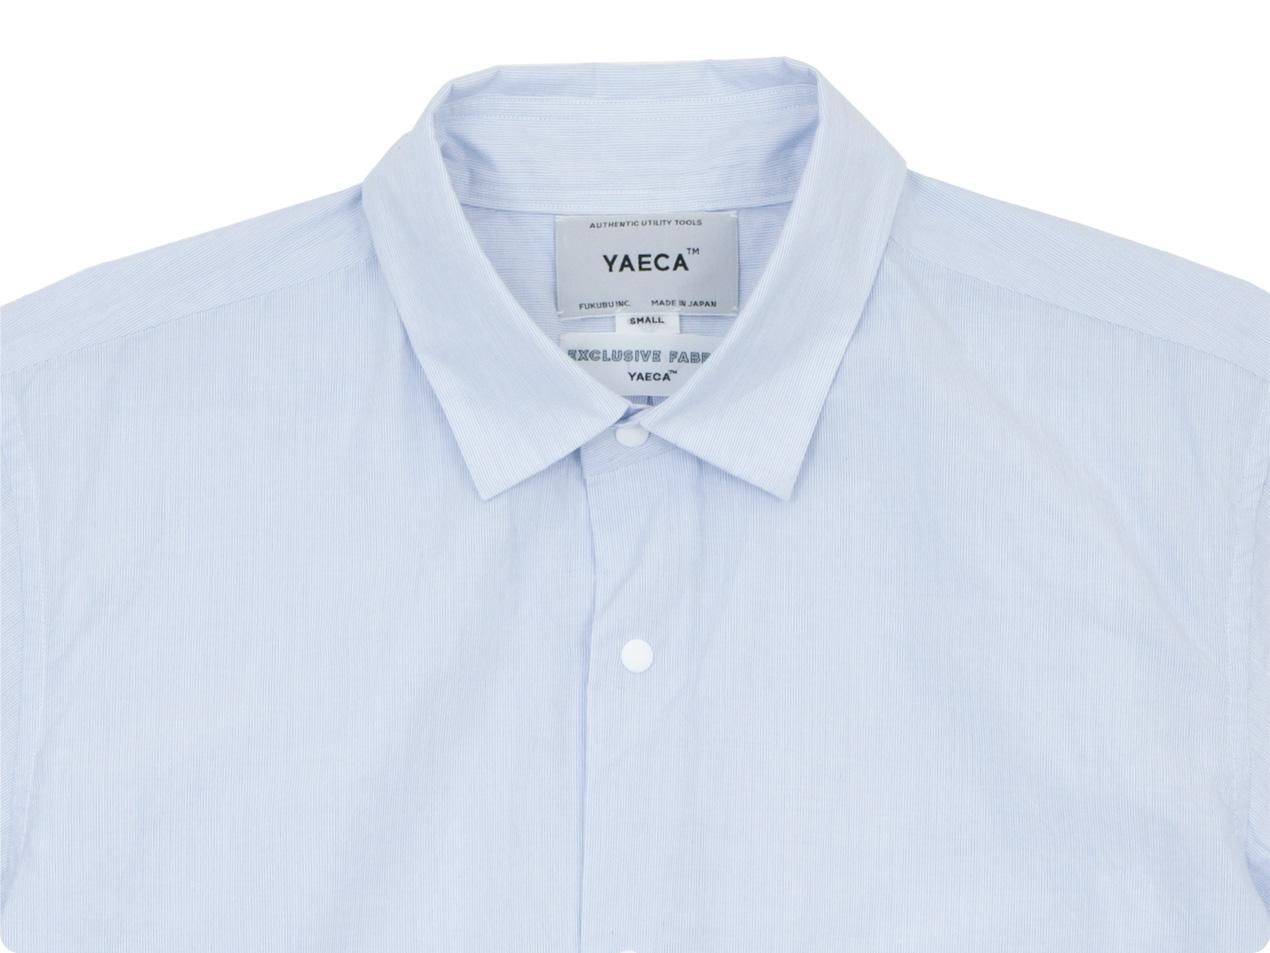 YAECA コンフォートシャツ リラックス ロング SAX STRIPE 〔メンズ〕